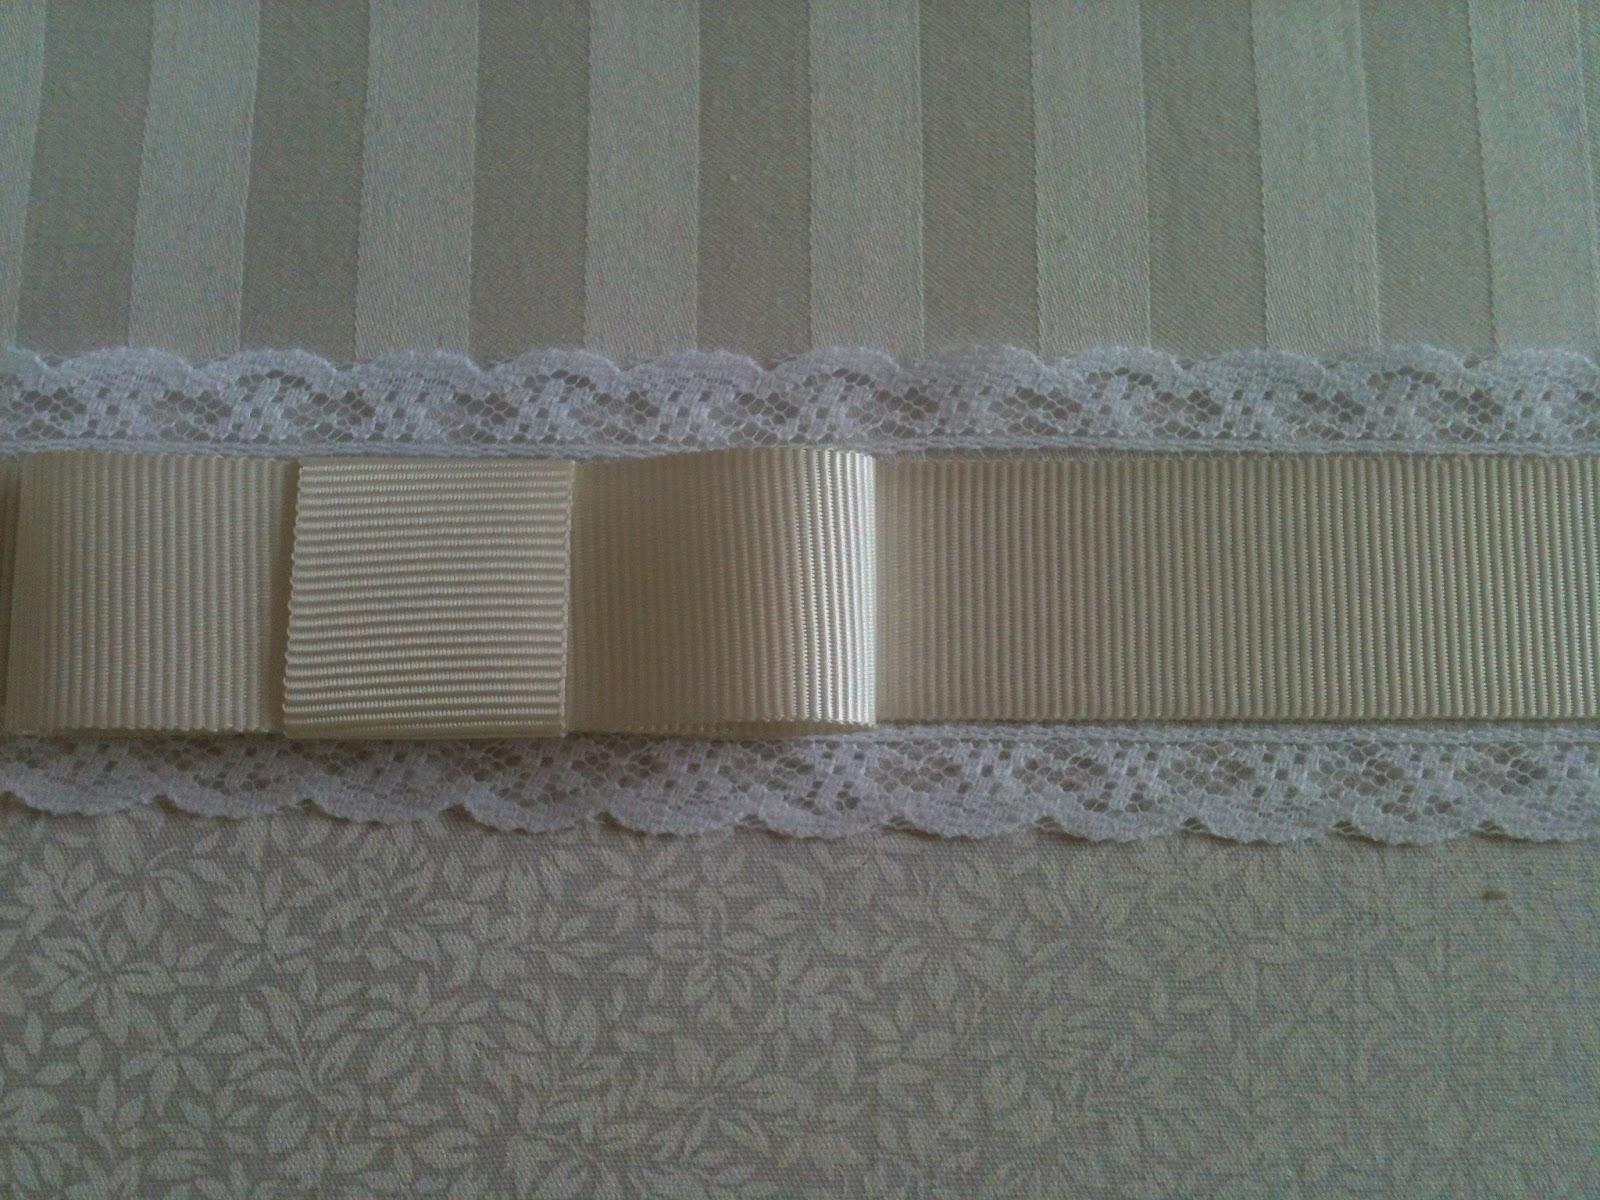 Atelier Furlanetto caixas arte design: Quer exclusividade  #5B5144 1600x1200